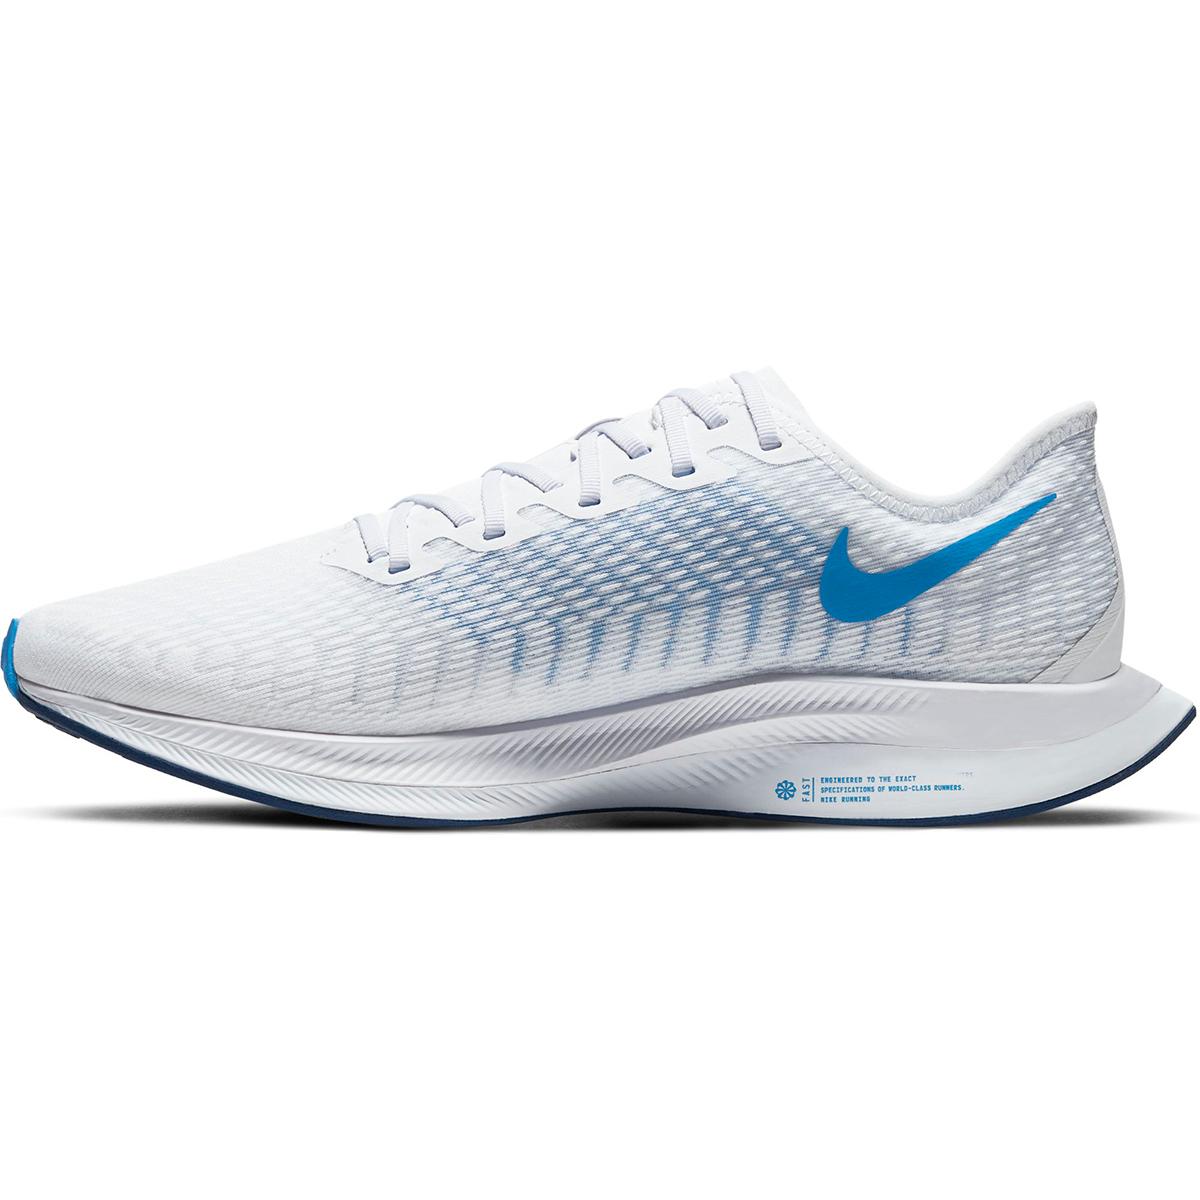 Men's Nike Zoom Pegasus Turbo 2 Running Shoe - Color: White/Blue Void/Football Grey/Photo Blue (Regular Width) - Size: 6, White/Blue Void/Football Grey/Photo Blue, large, image 2